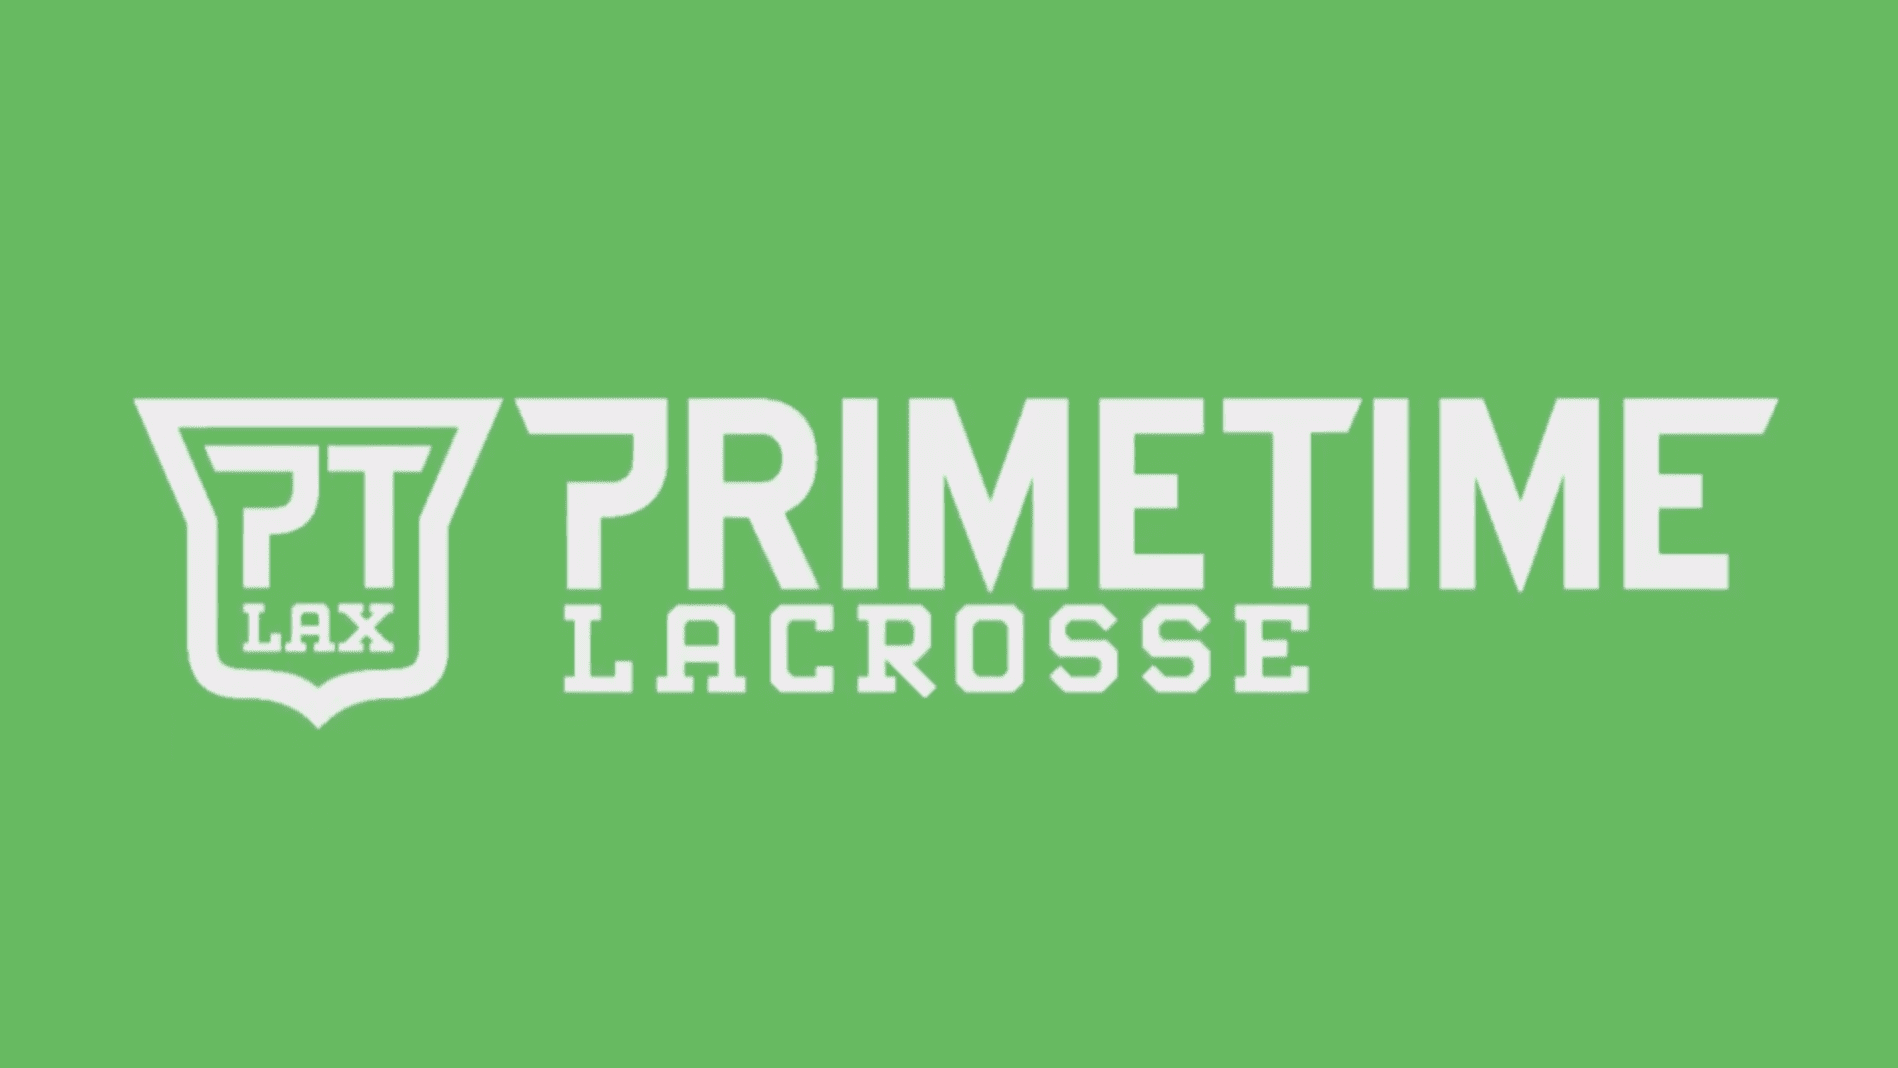 primetime lacrosse title card